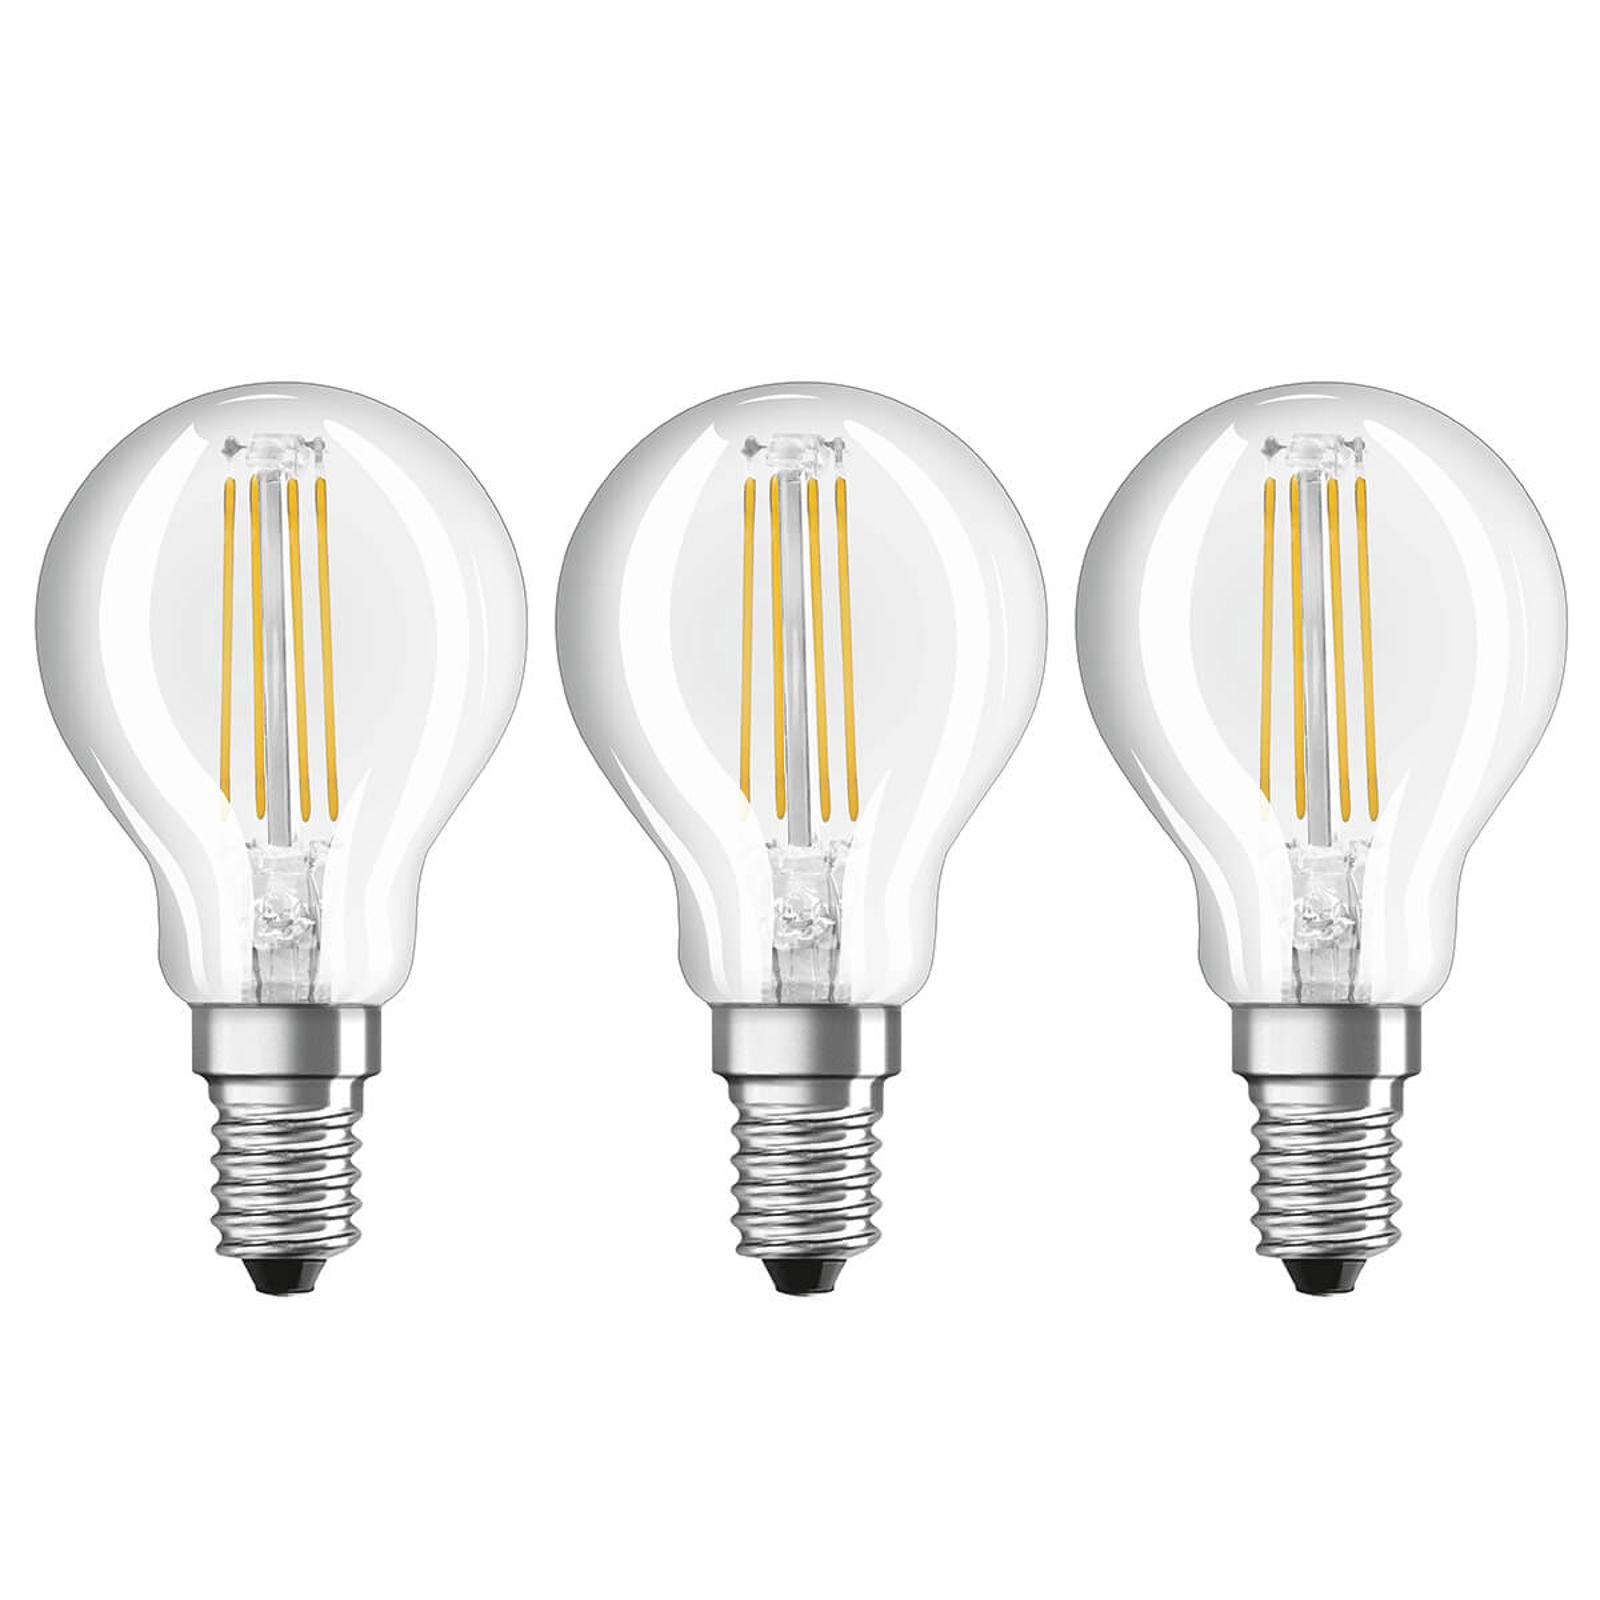 LED-Filament-Lampe E14 4 W, warmweiß, 3er-Set